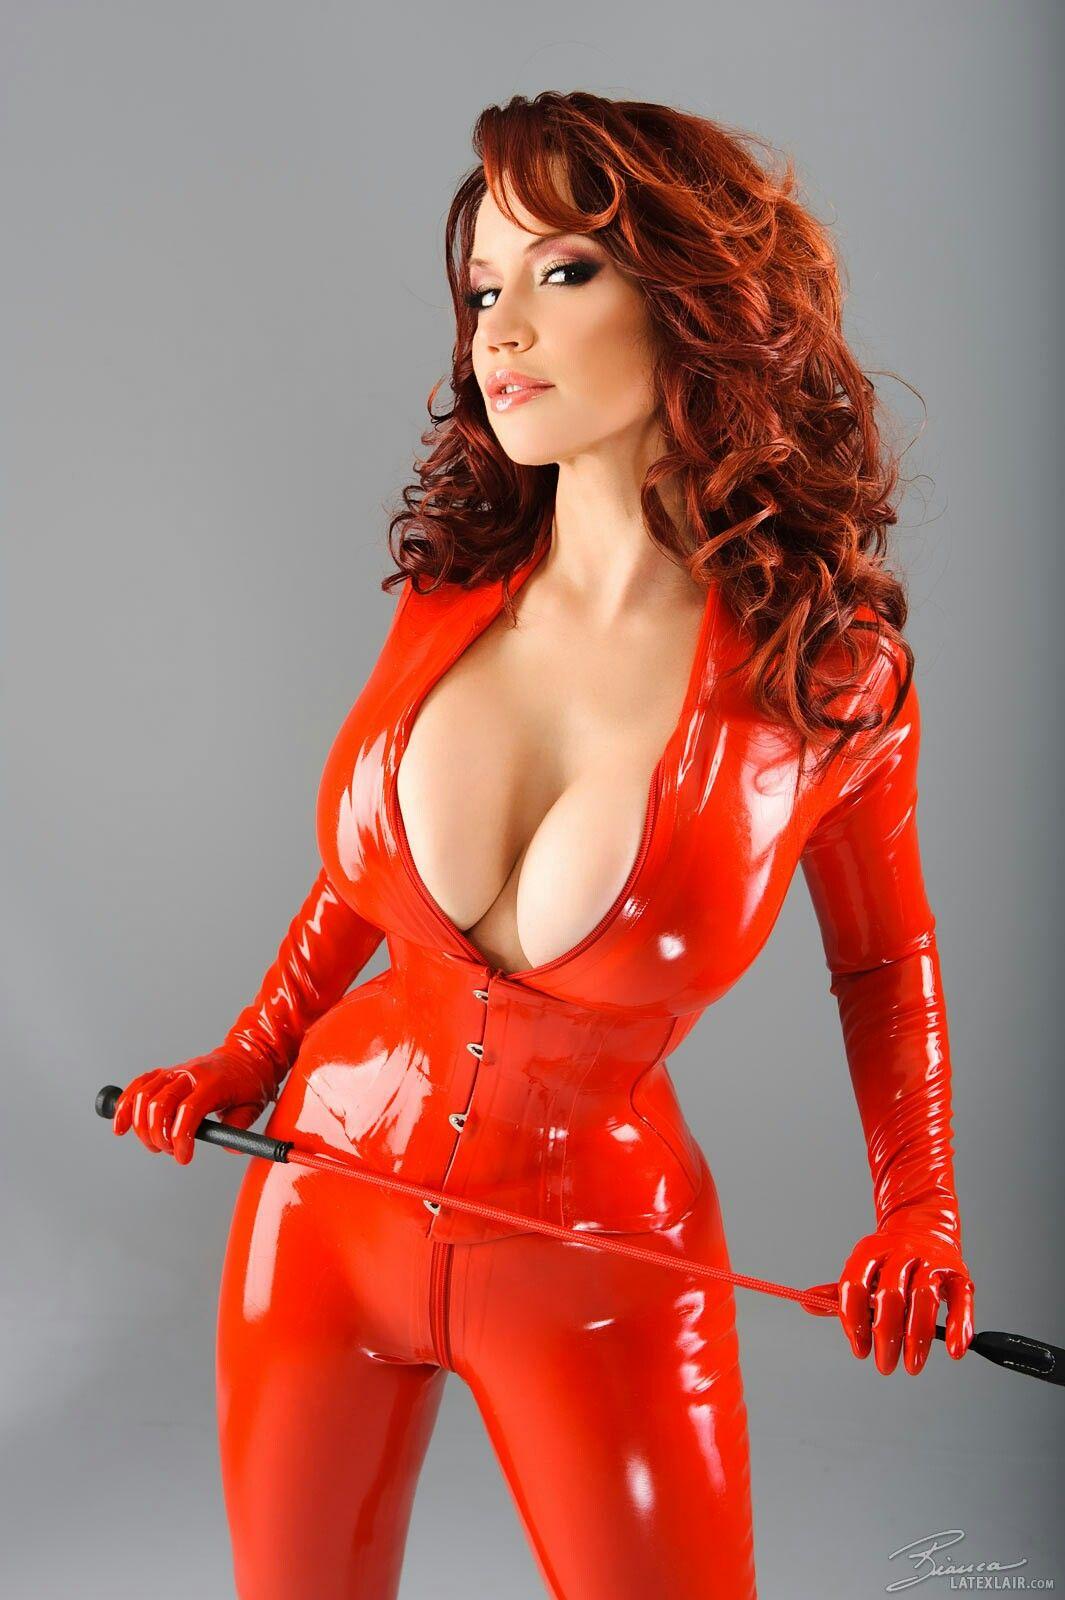 Bianca beauchamp latex mistress